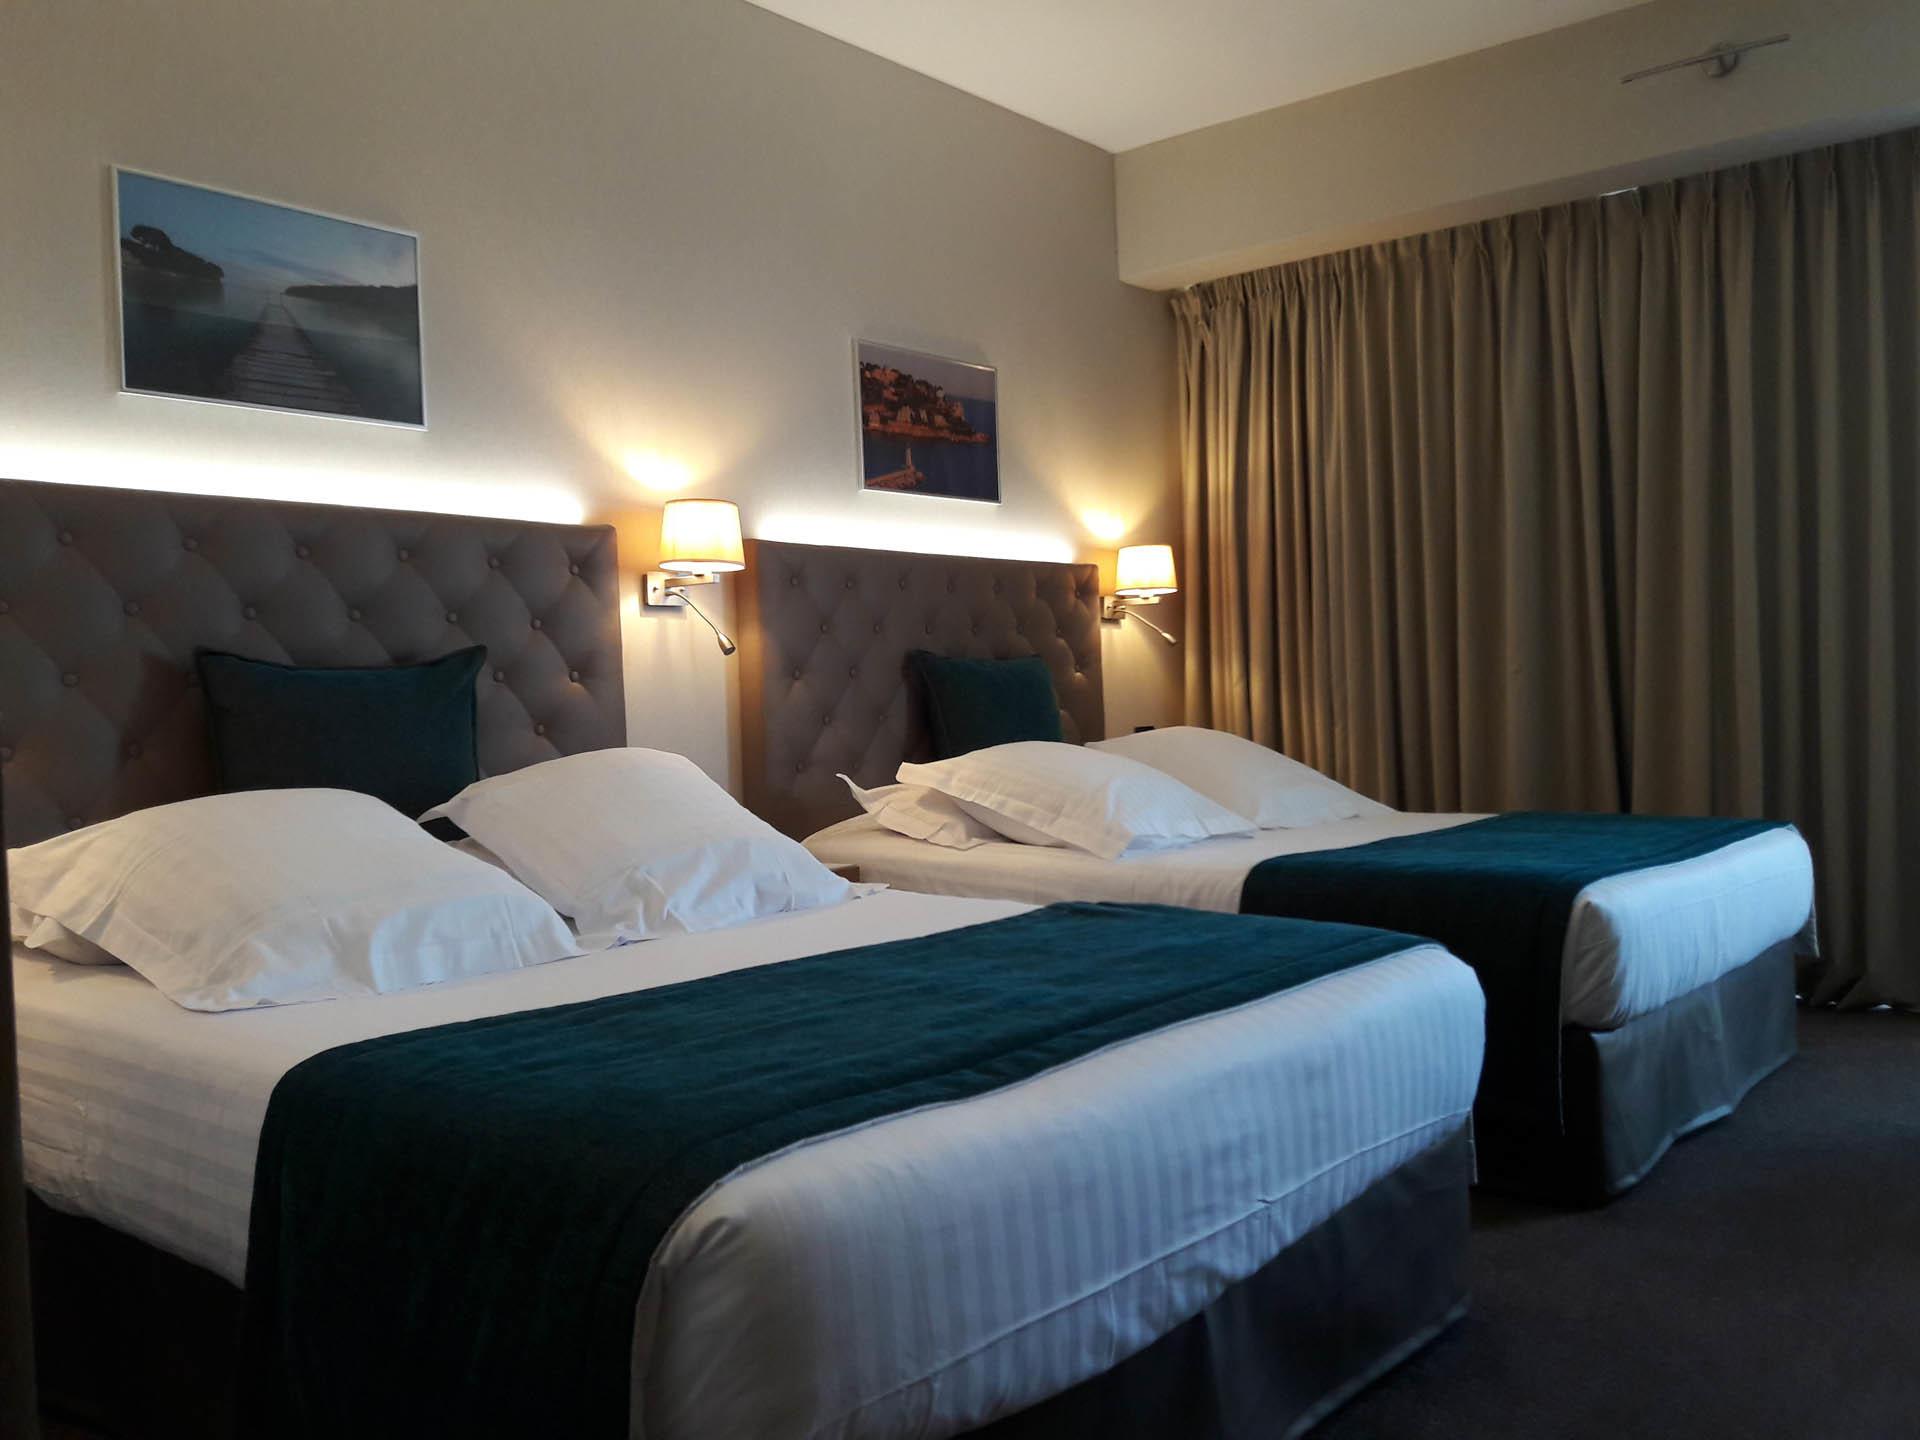 Splendid Hotel and Spa Family Room